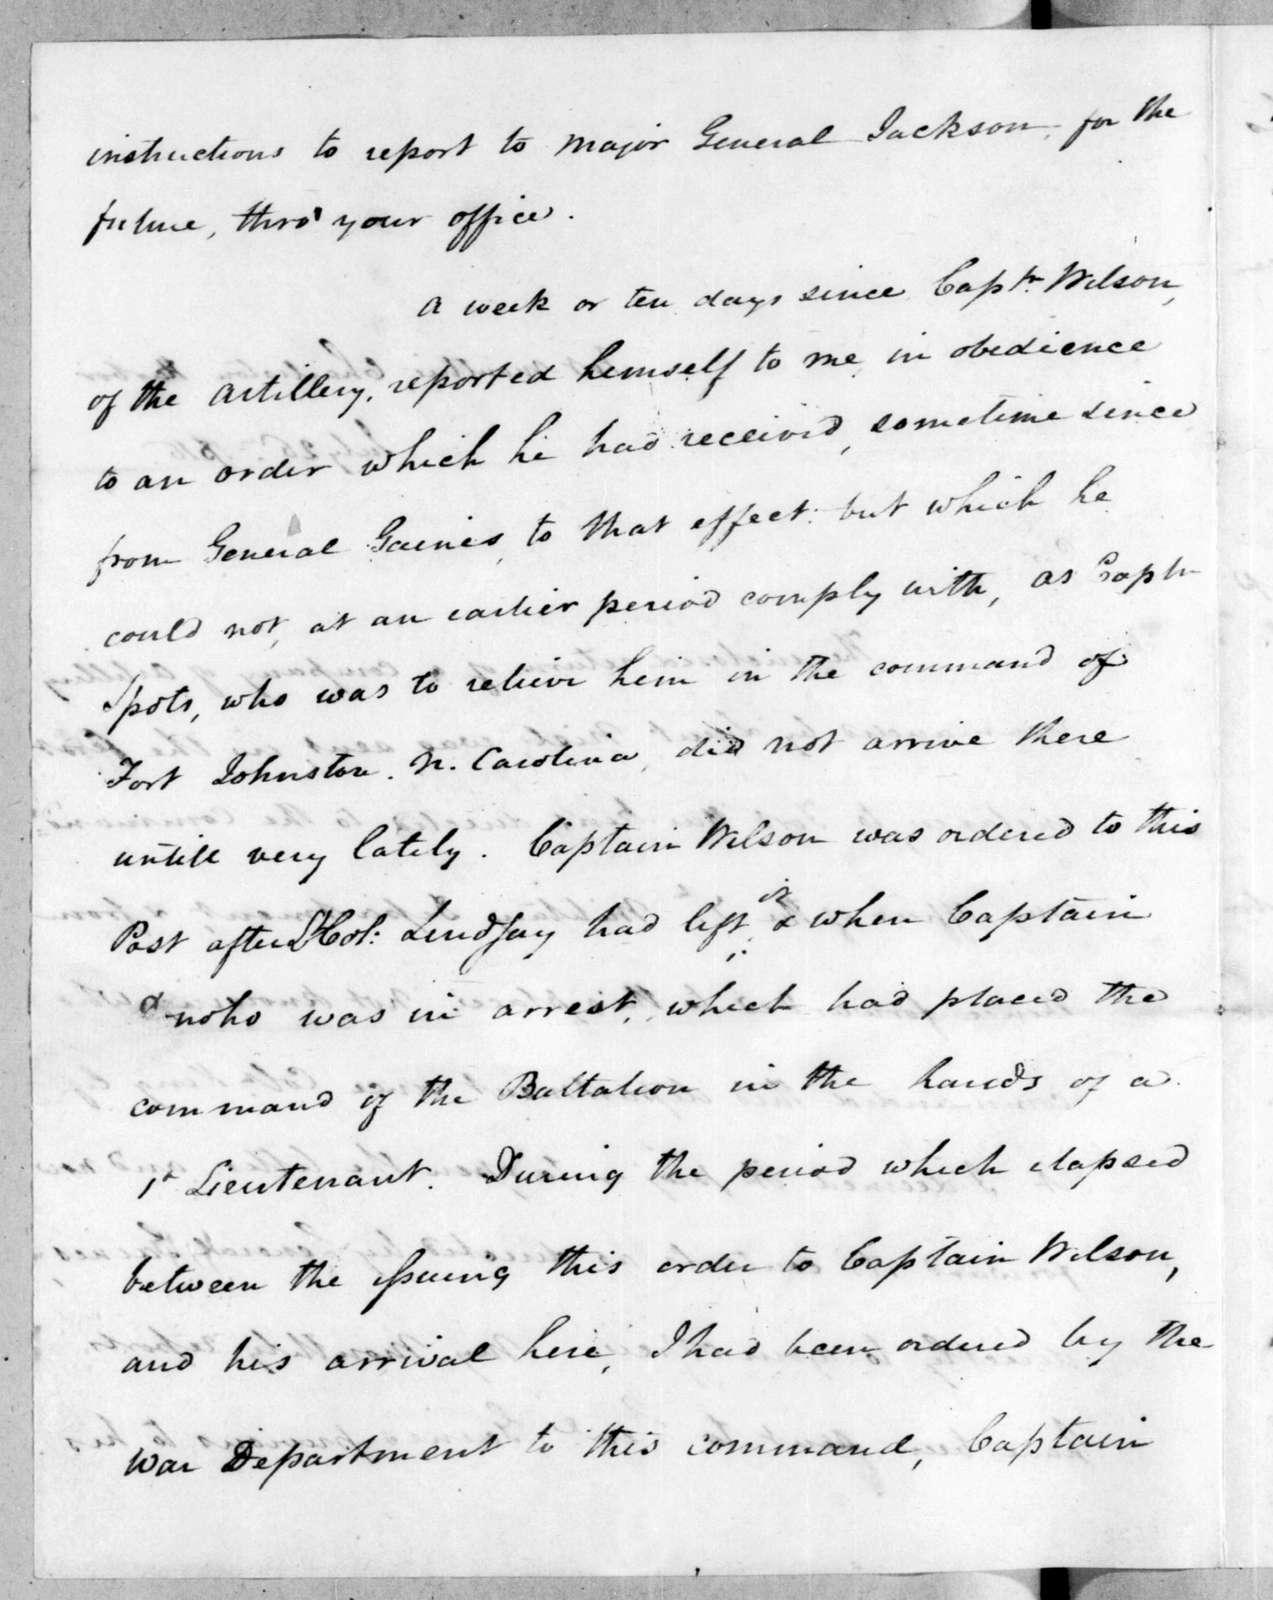 James Bankhead to Robert Butler, July 26, 1816